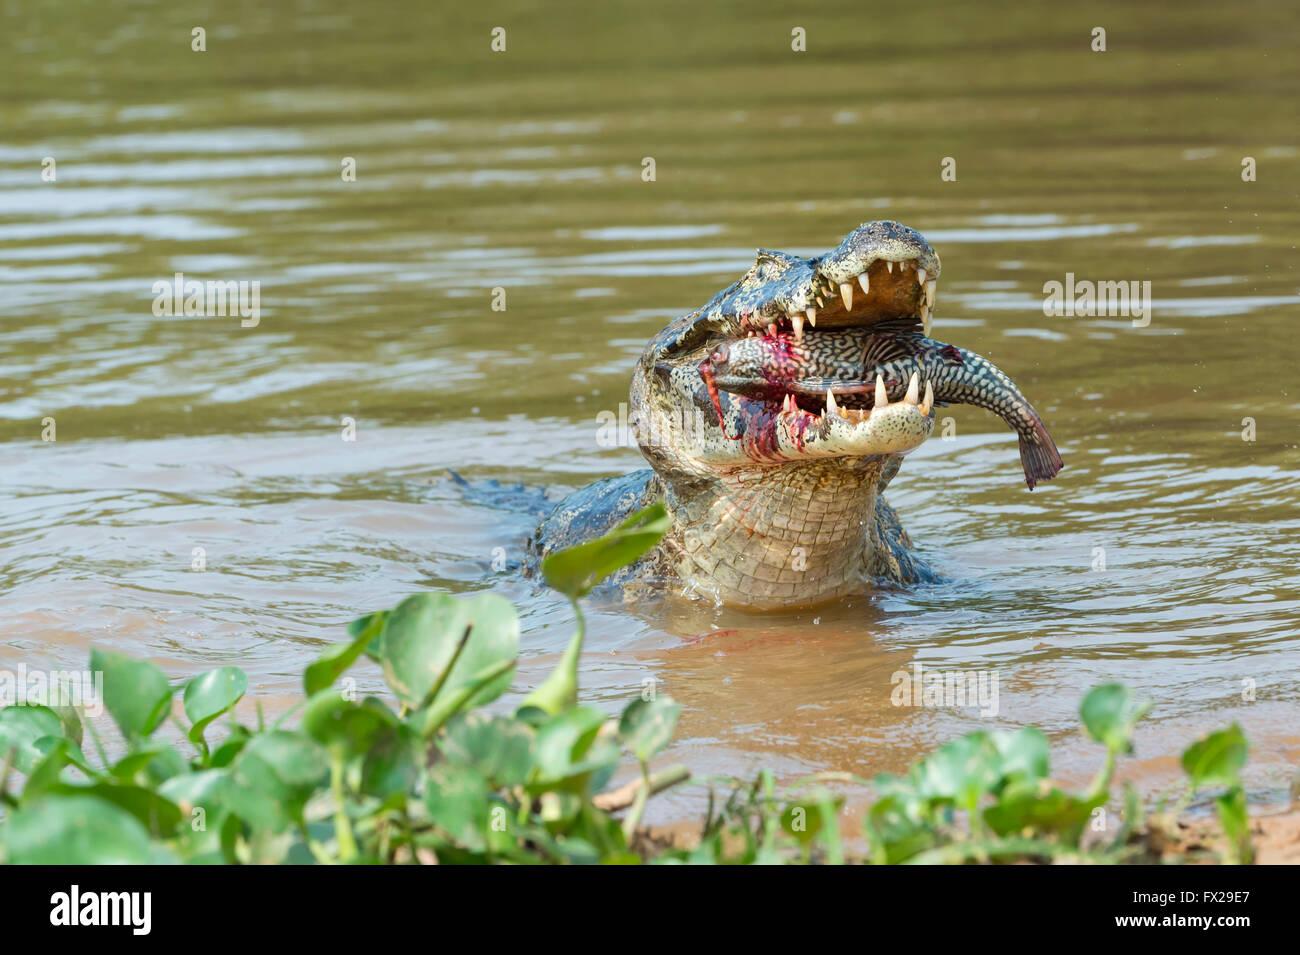 Yacare caiman (Caiman yacare) devouring a fish, Cuiaba river, Pantanal, Brazil - Stock Image